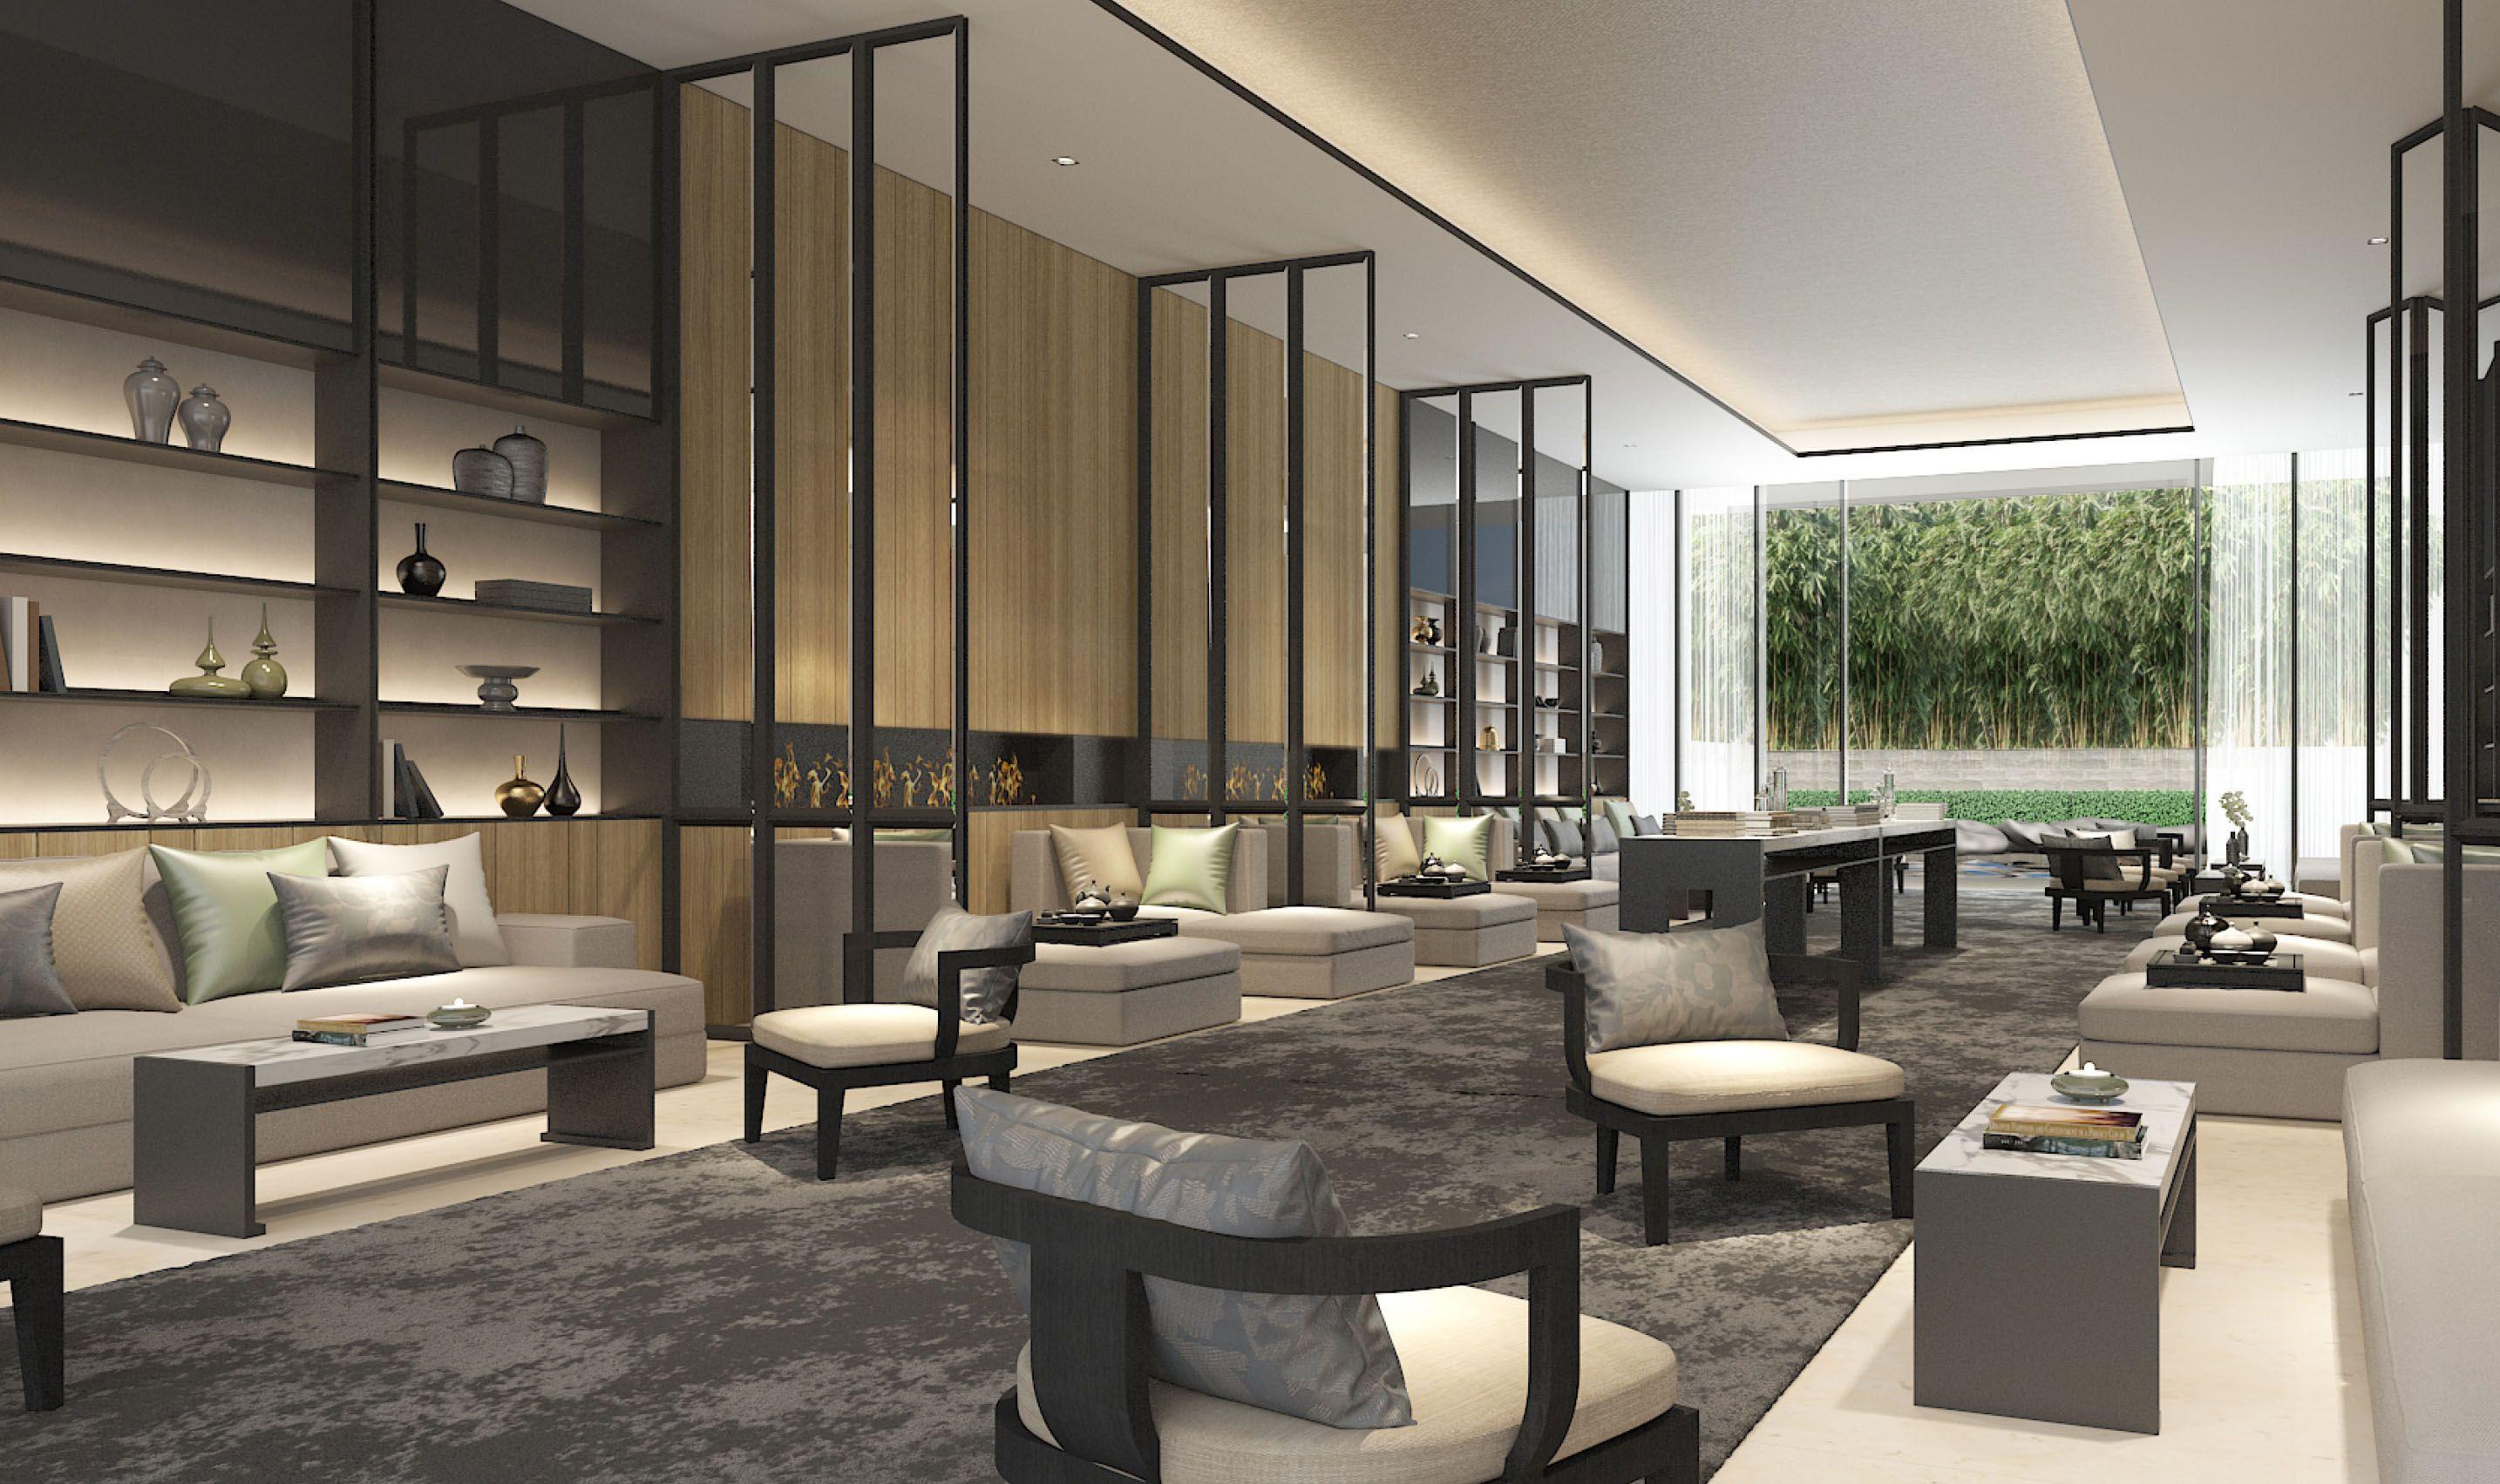 Scda Hotel & Mixed- Development Nanjing China- Spa